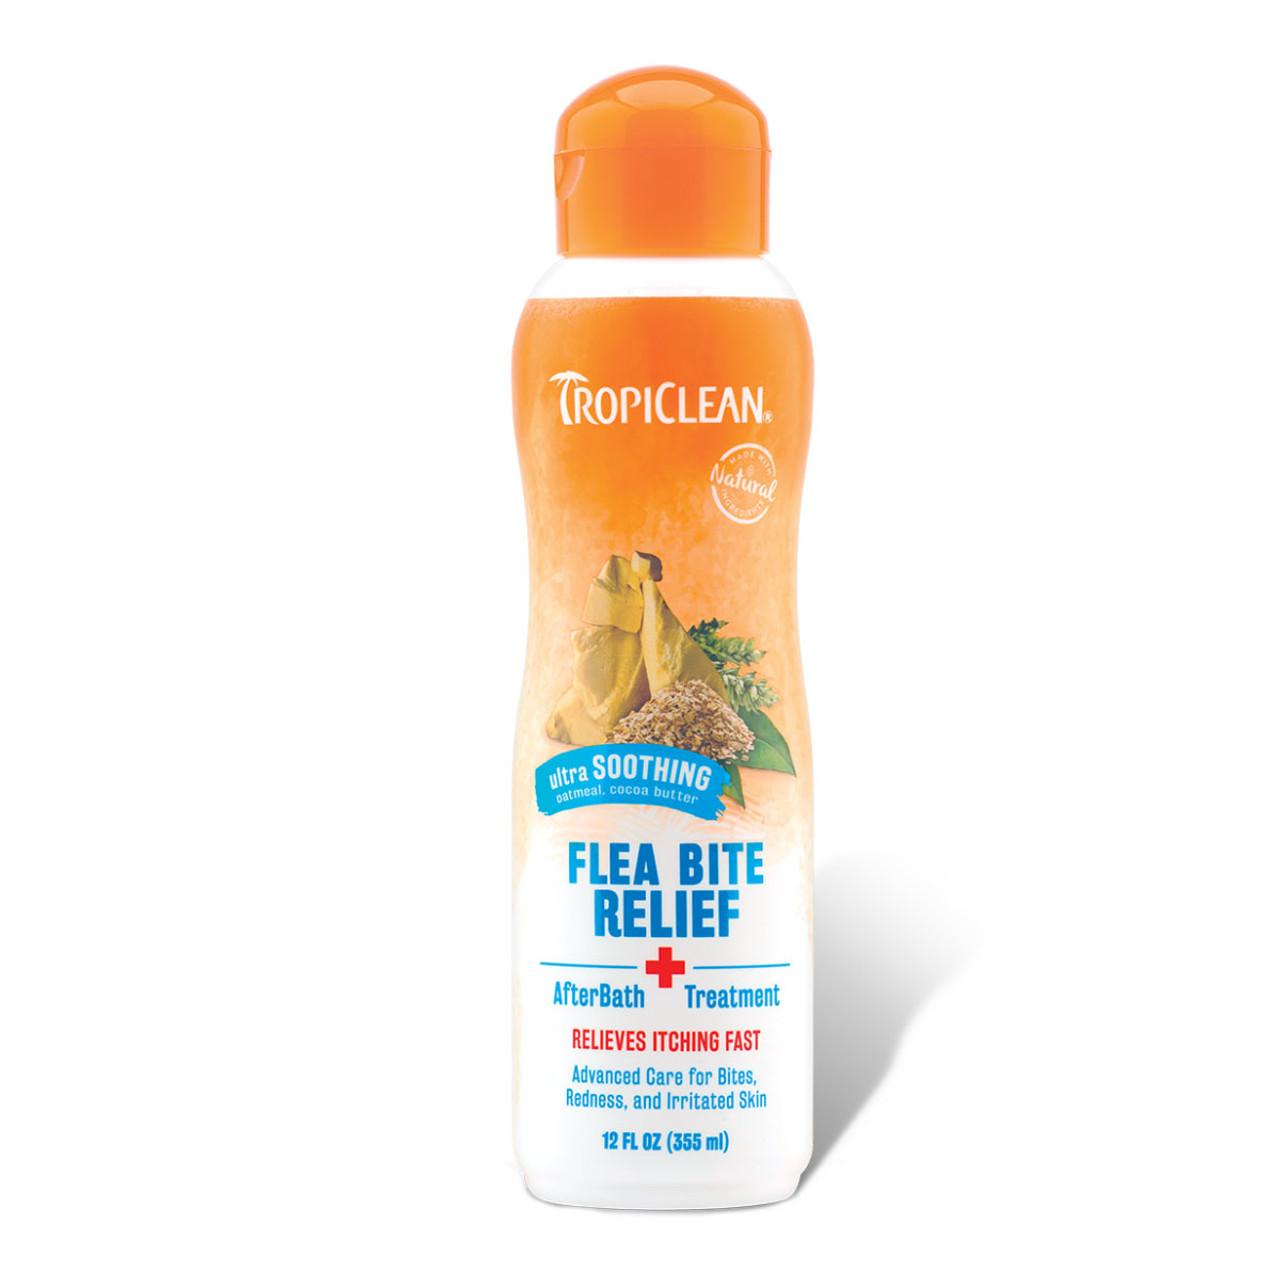 TropiClean Natural Flea & Tick Bite Relief After Bath Treatment for Pets